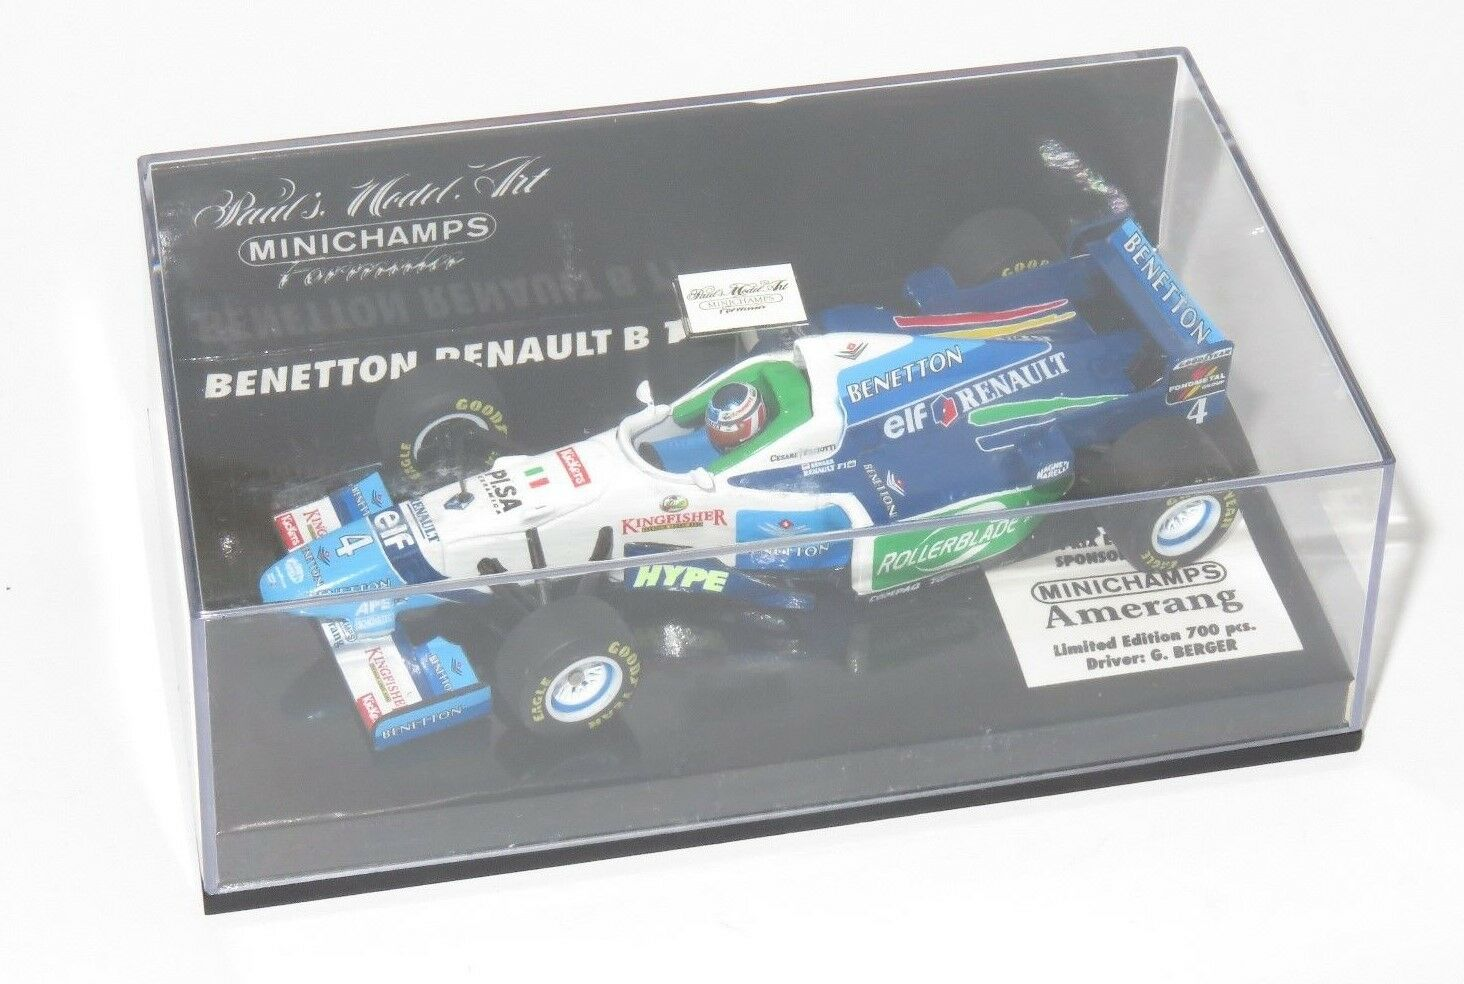 marcas de diseñadores baratos 1 43 Benetton Renault B196 British Grand Prix Prix Prix edición 1996 Gerhard Berger  mas barato